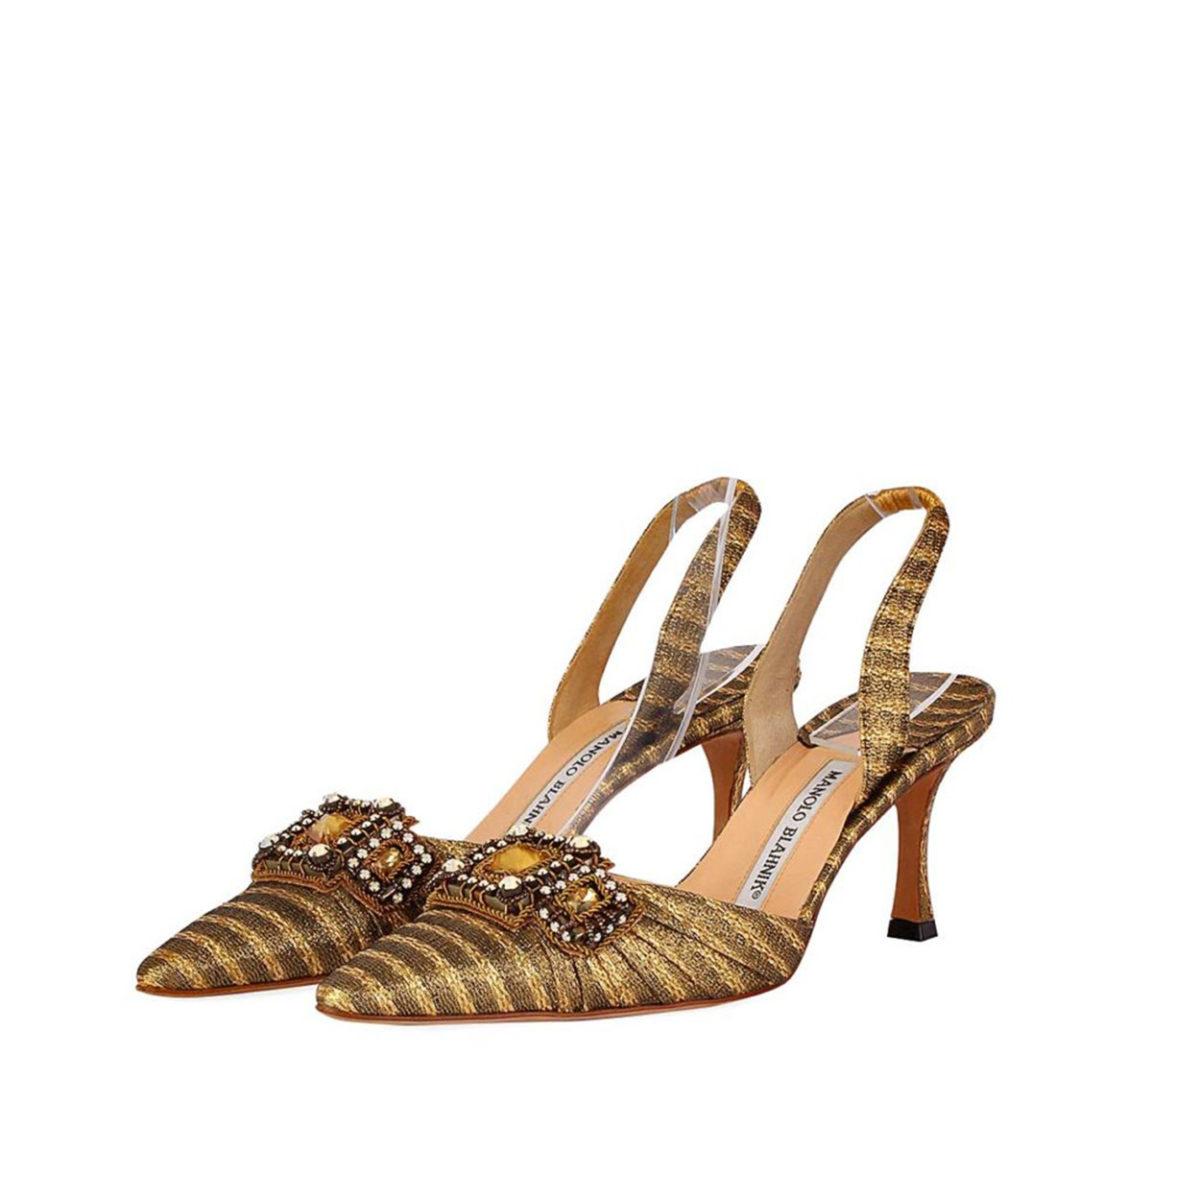 912914ef9c98 MANOLO BLAHNIK Silk Buckle Kitten Heel Carolyne Slingbacks Gold - S ...